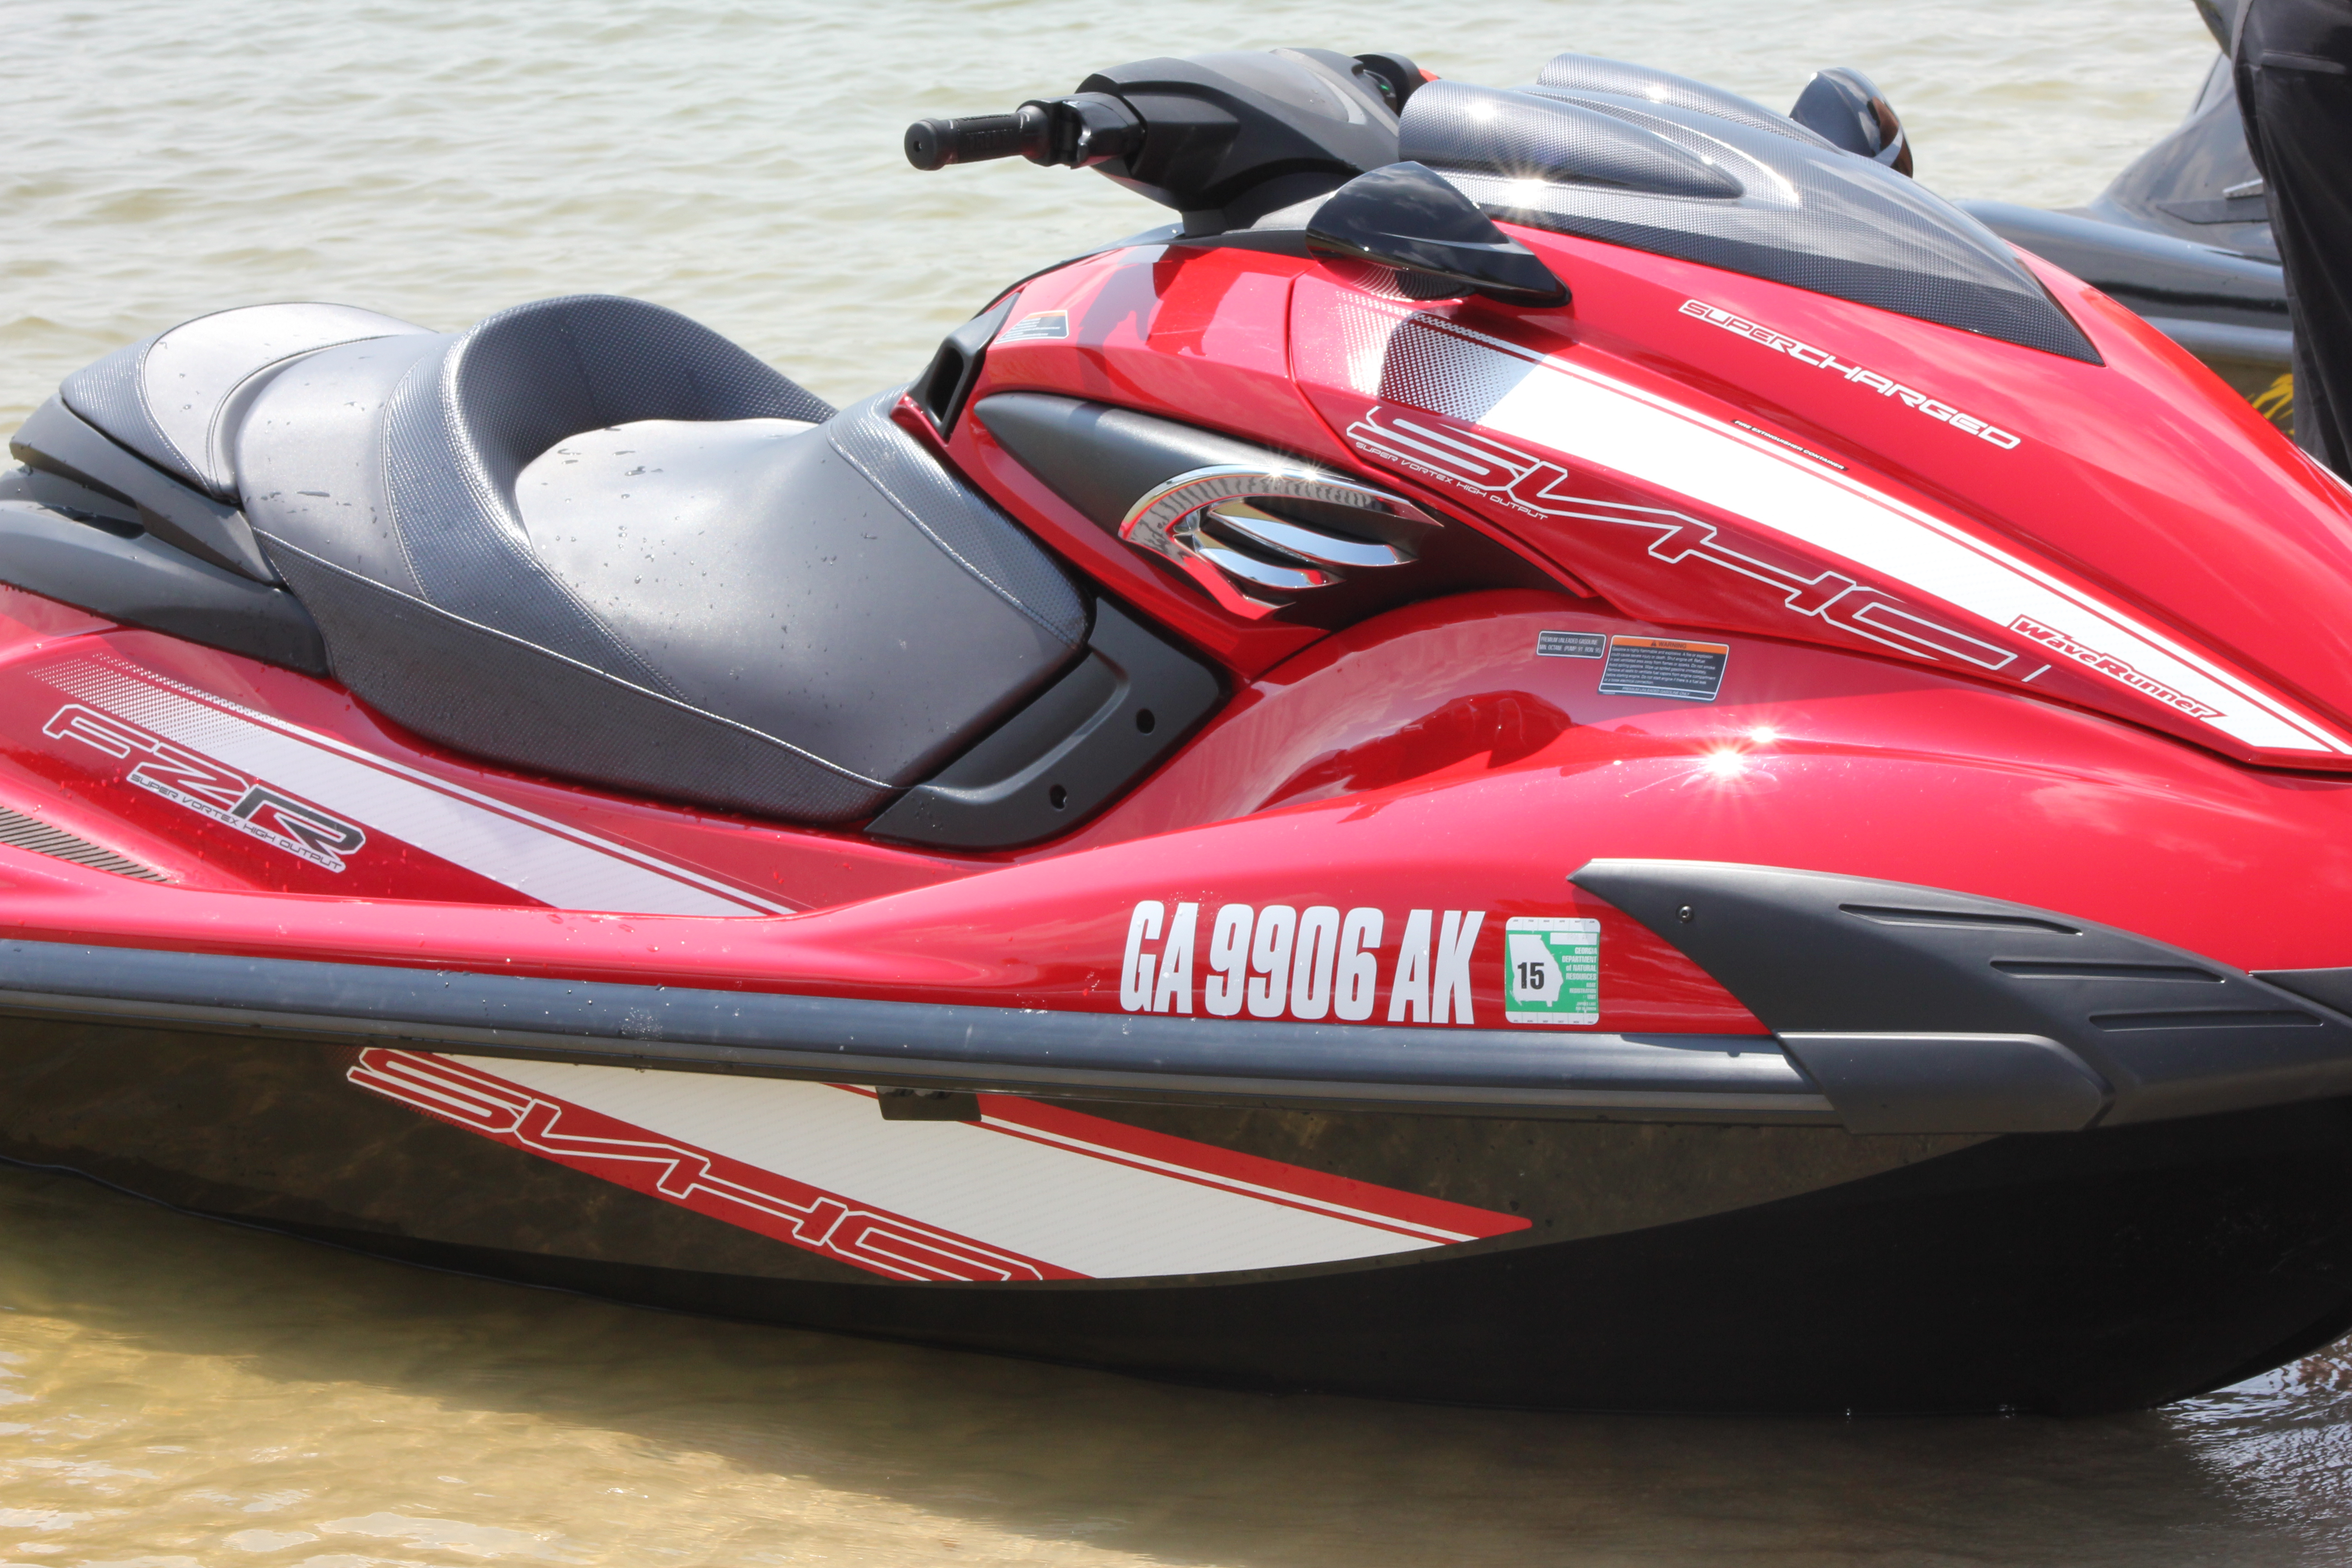 2015 vx yamaha jet ski for sale autos post for Yamaha jet ski 2014